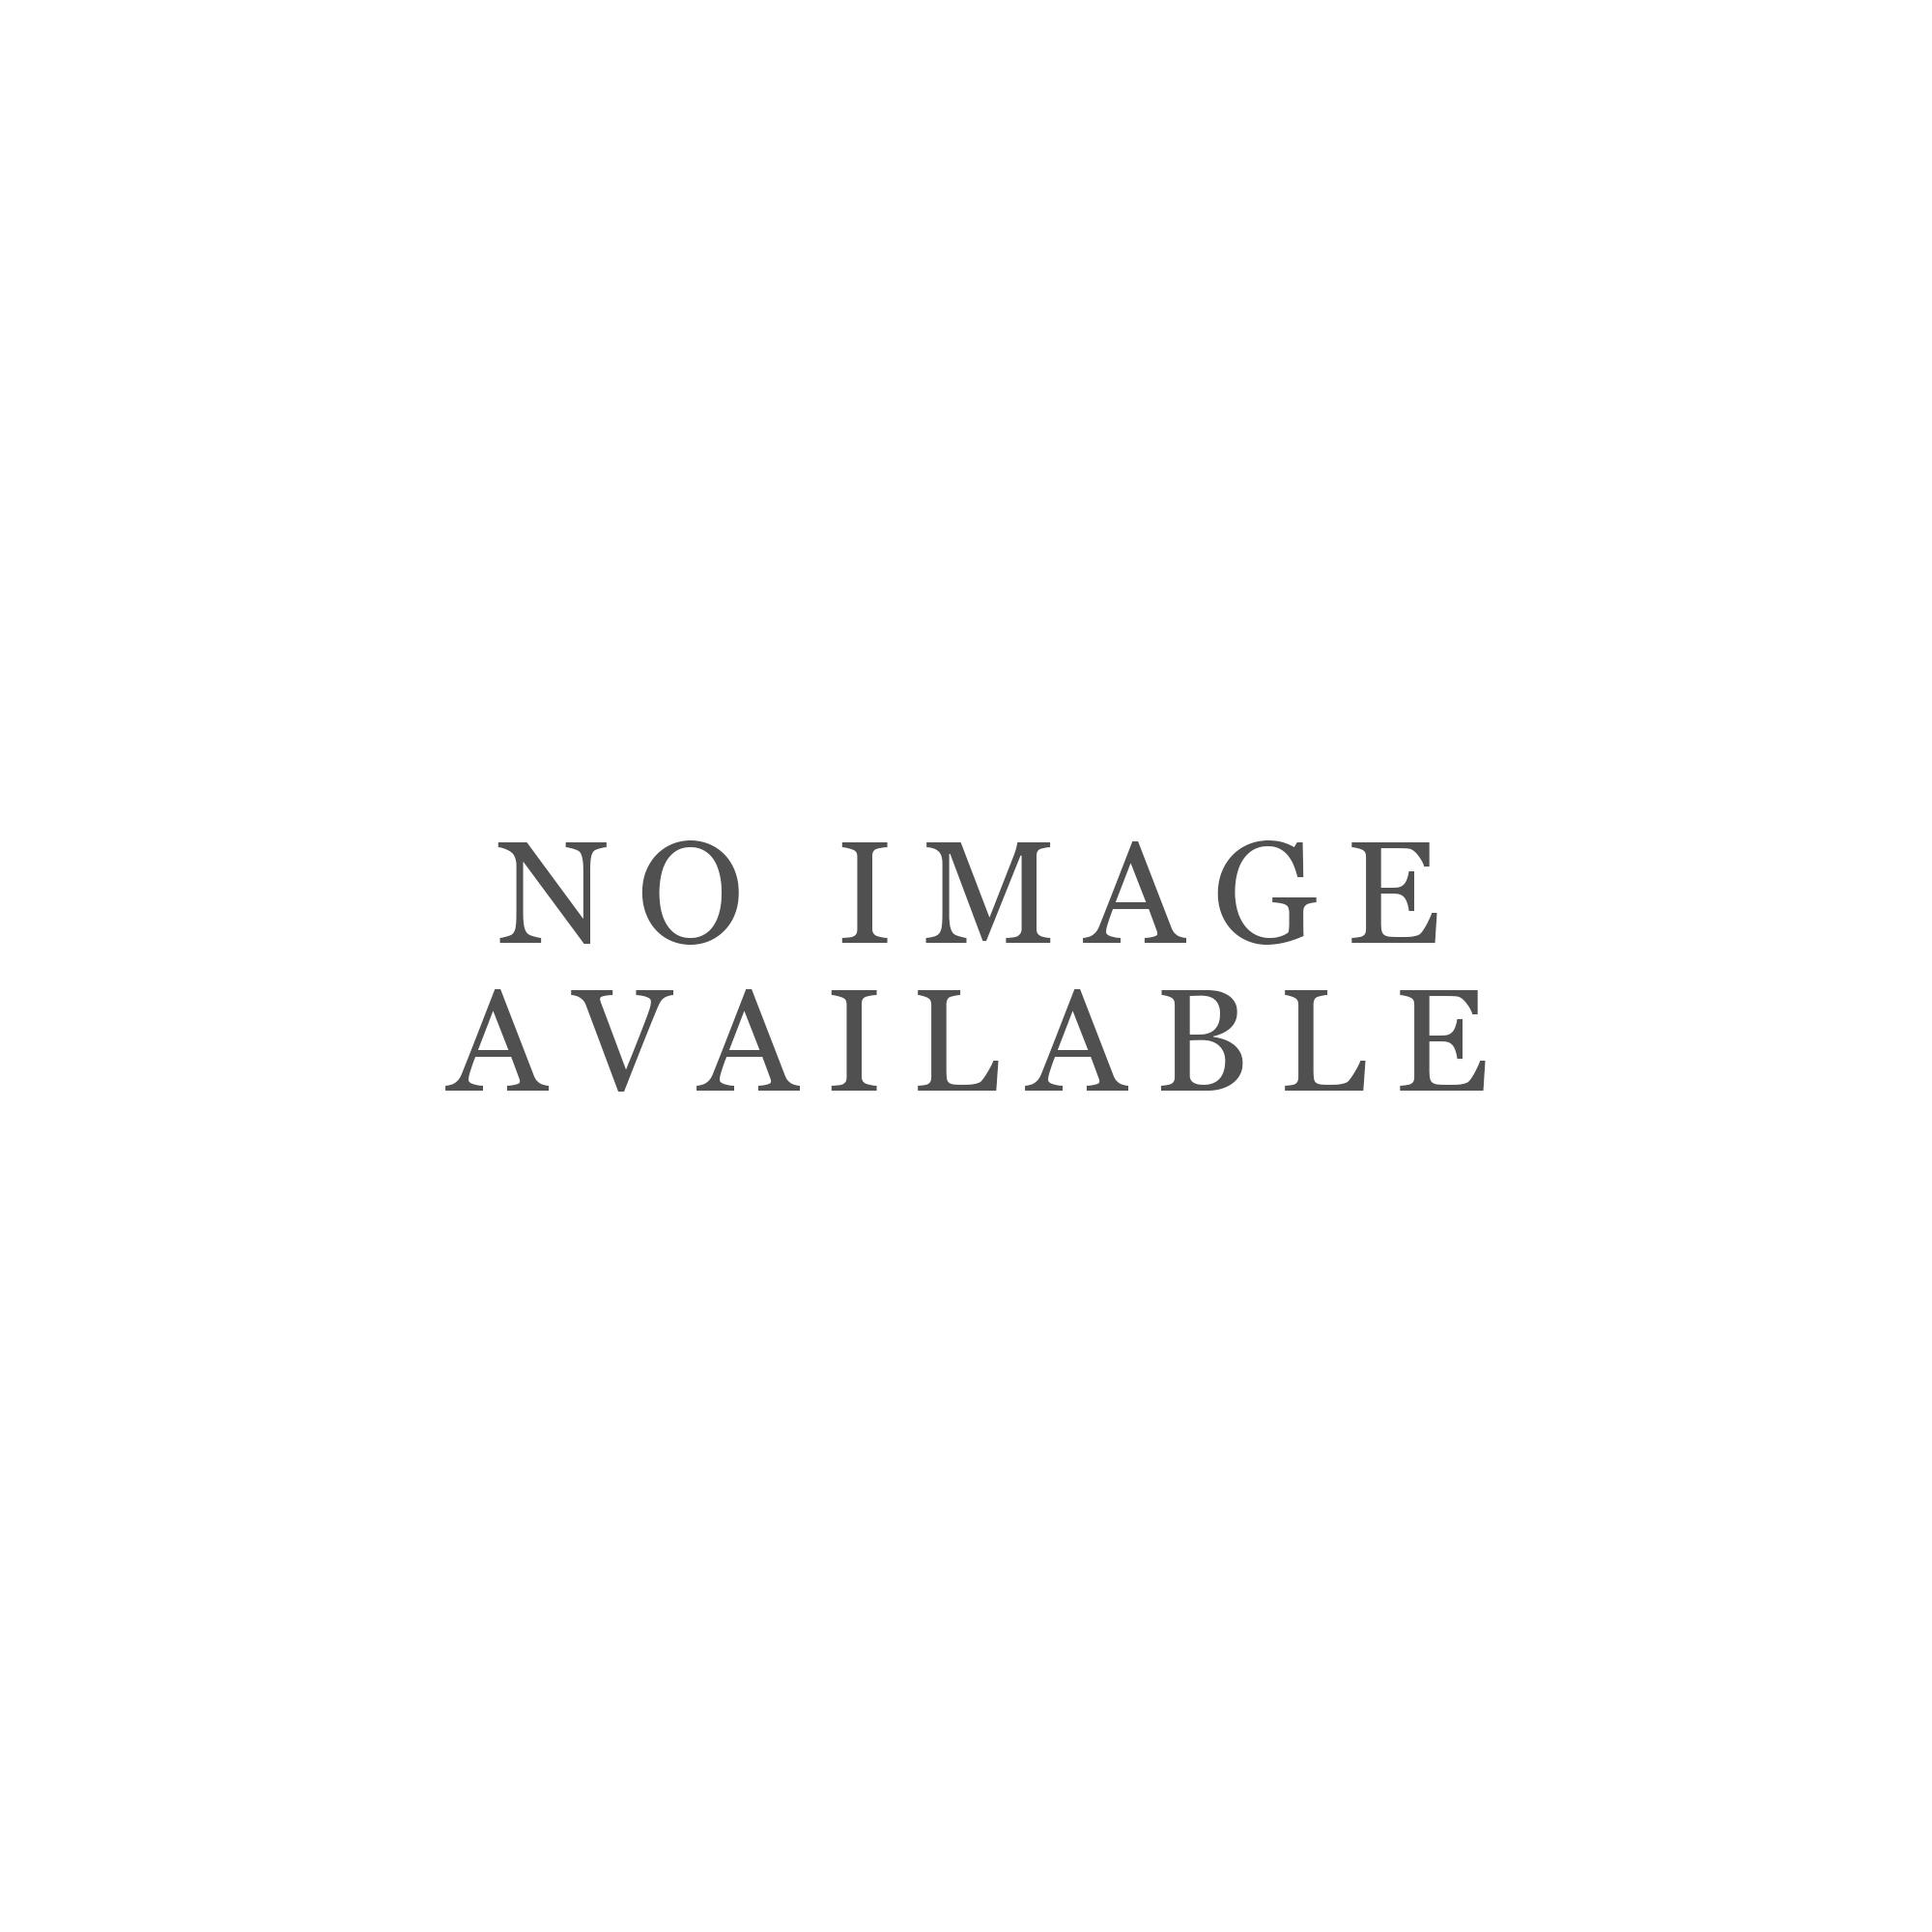 Earring 9ct 0208 Blue Topaz